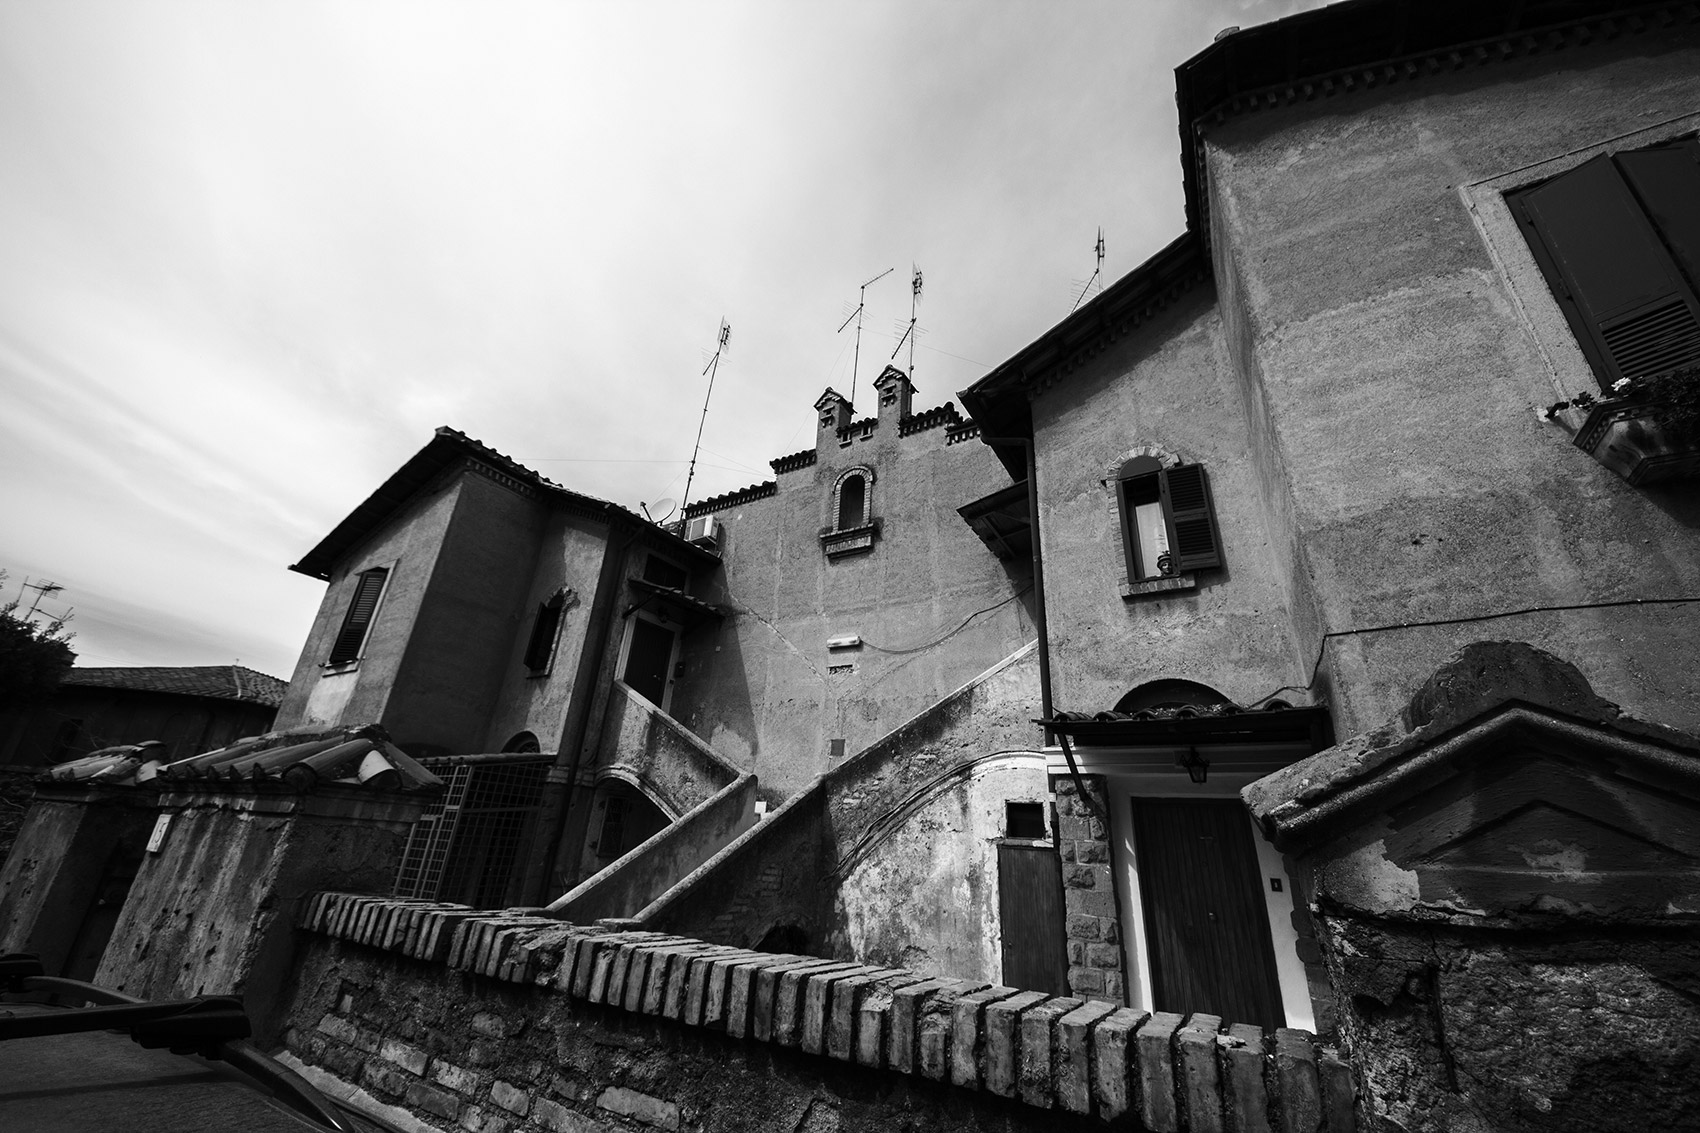 Buildings from the '30s in Garbatella, Rome.